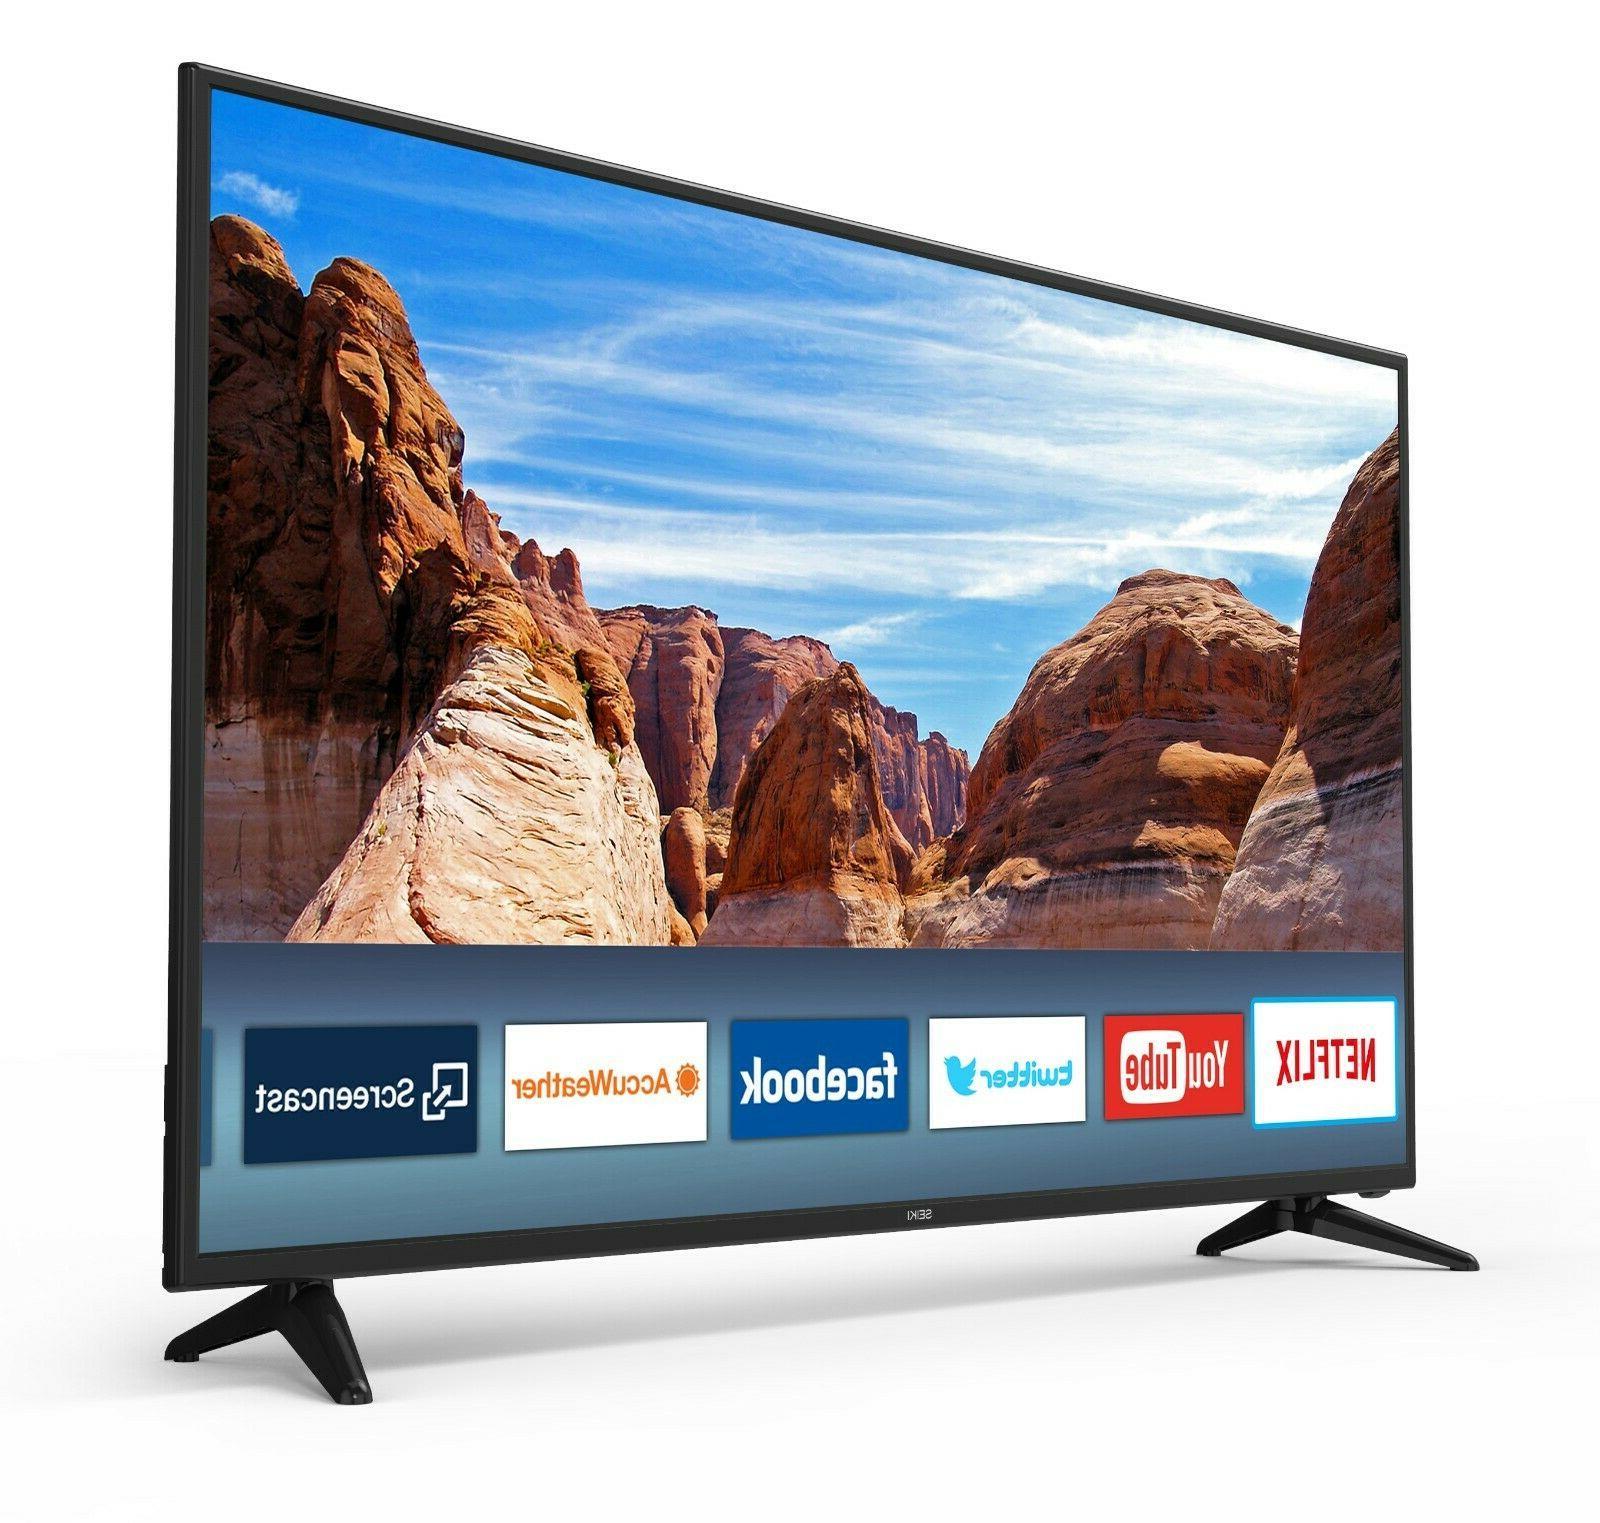 60 inch HD Video, LED TV HDMI